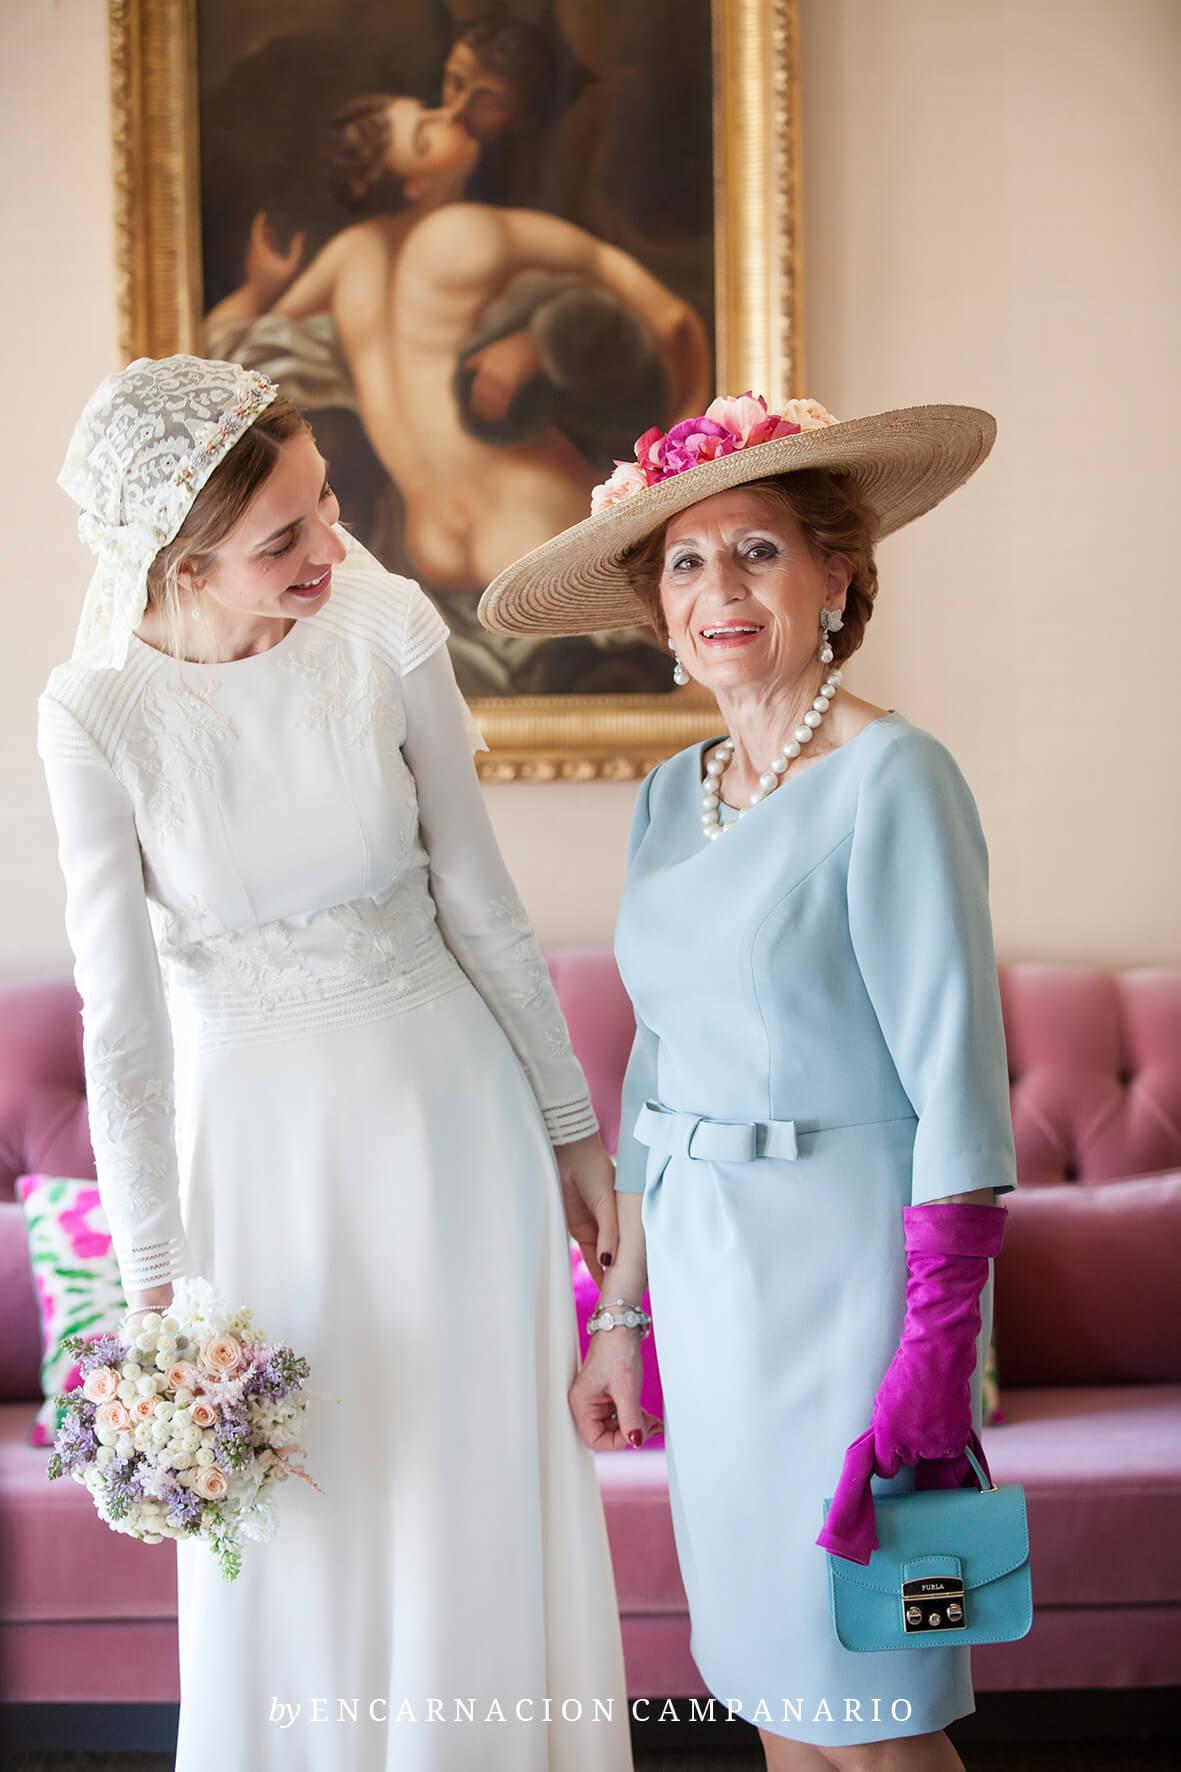 La boda de Carmina y Nacho en Jerez BODAS Sin categora